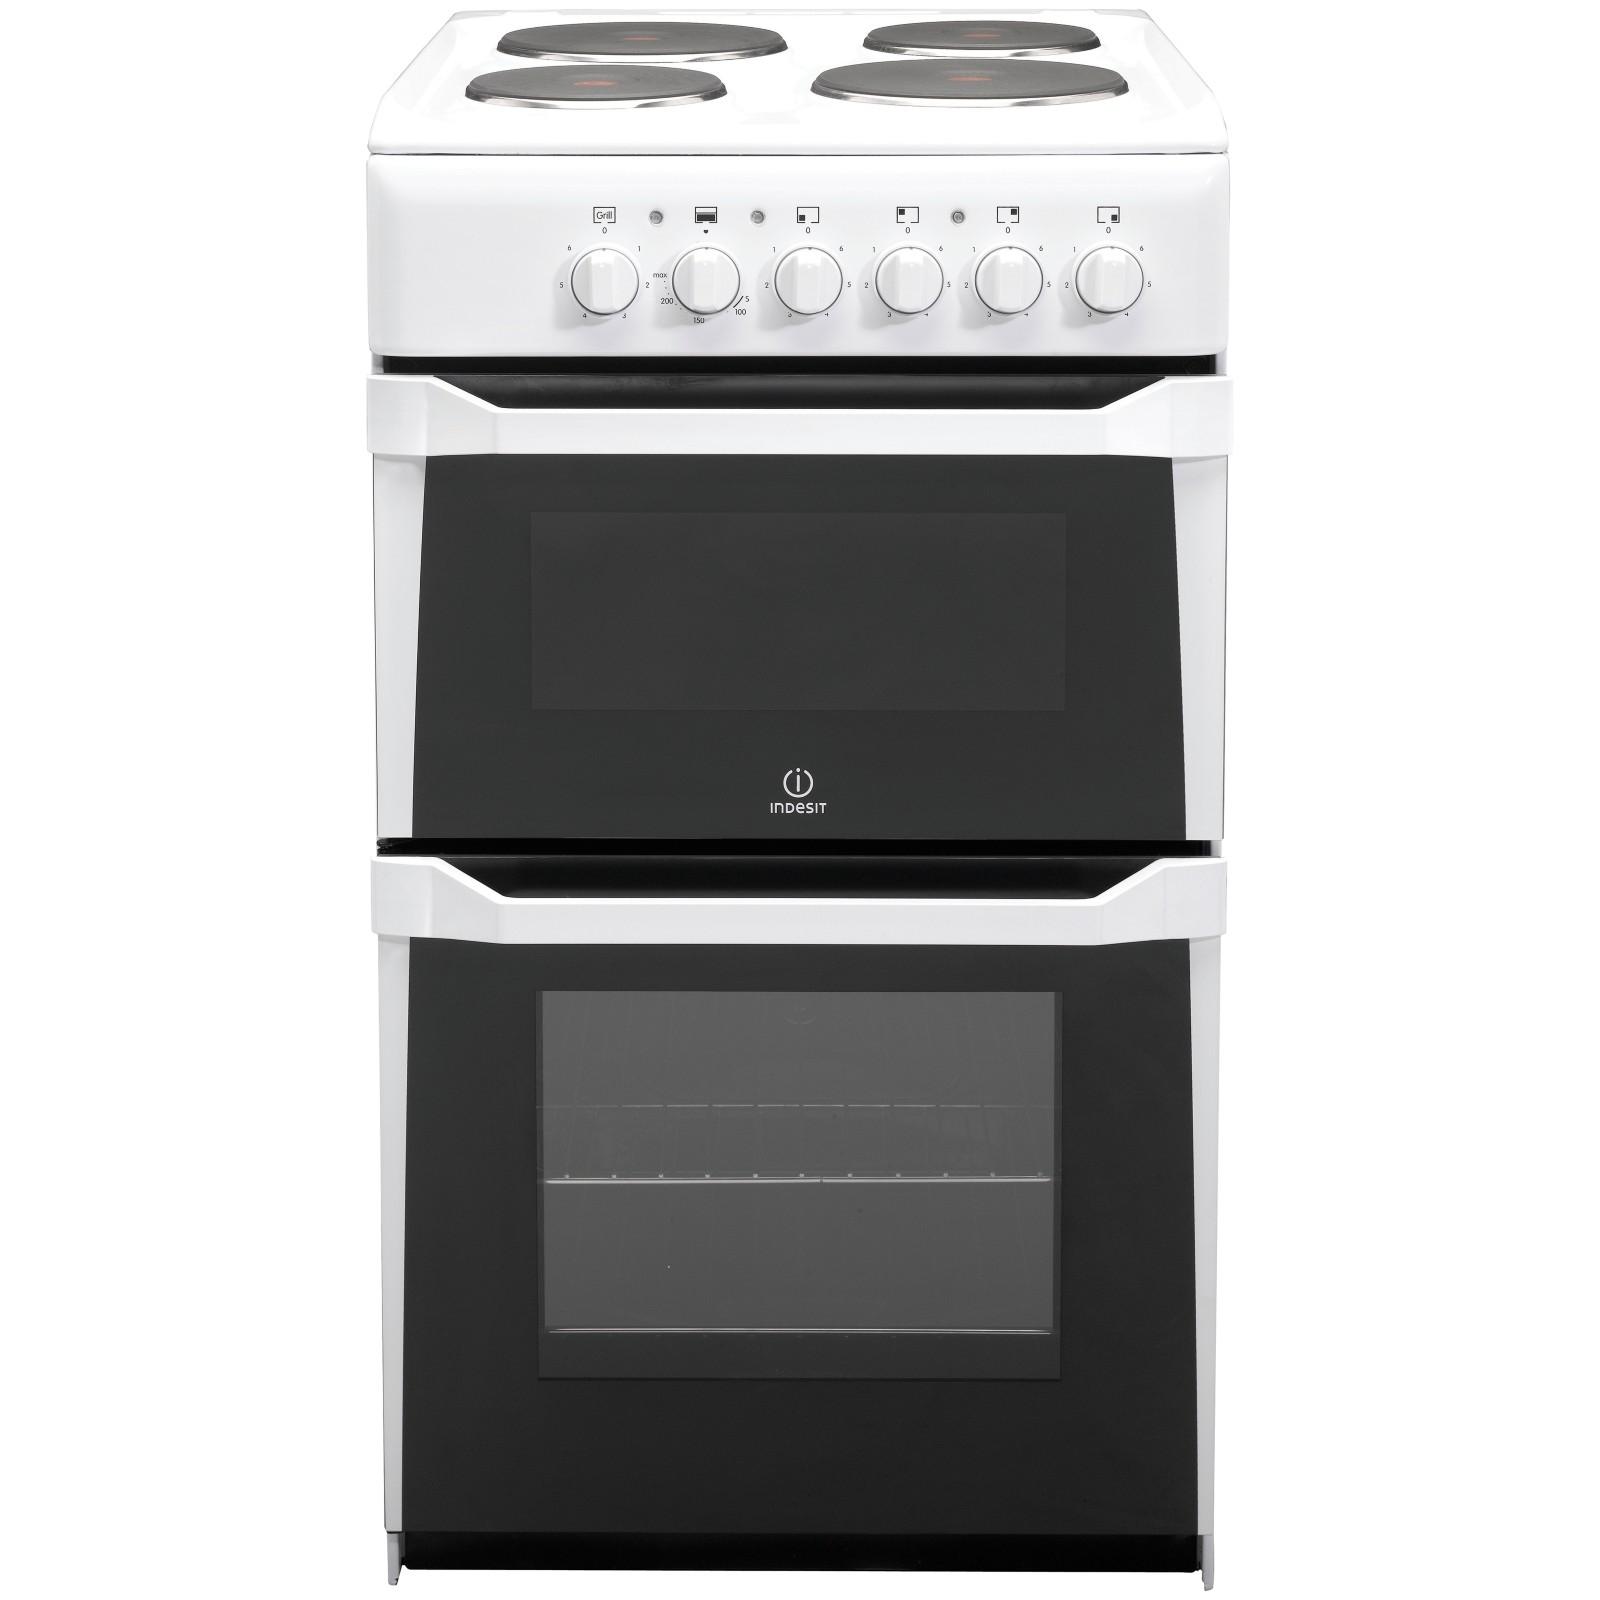 Indesit IT50EWS Electric Cooker